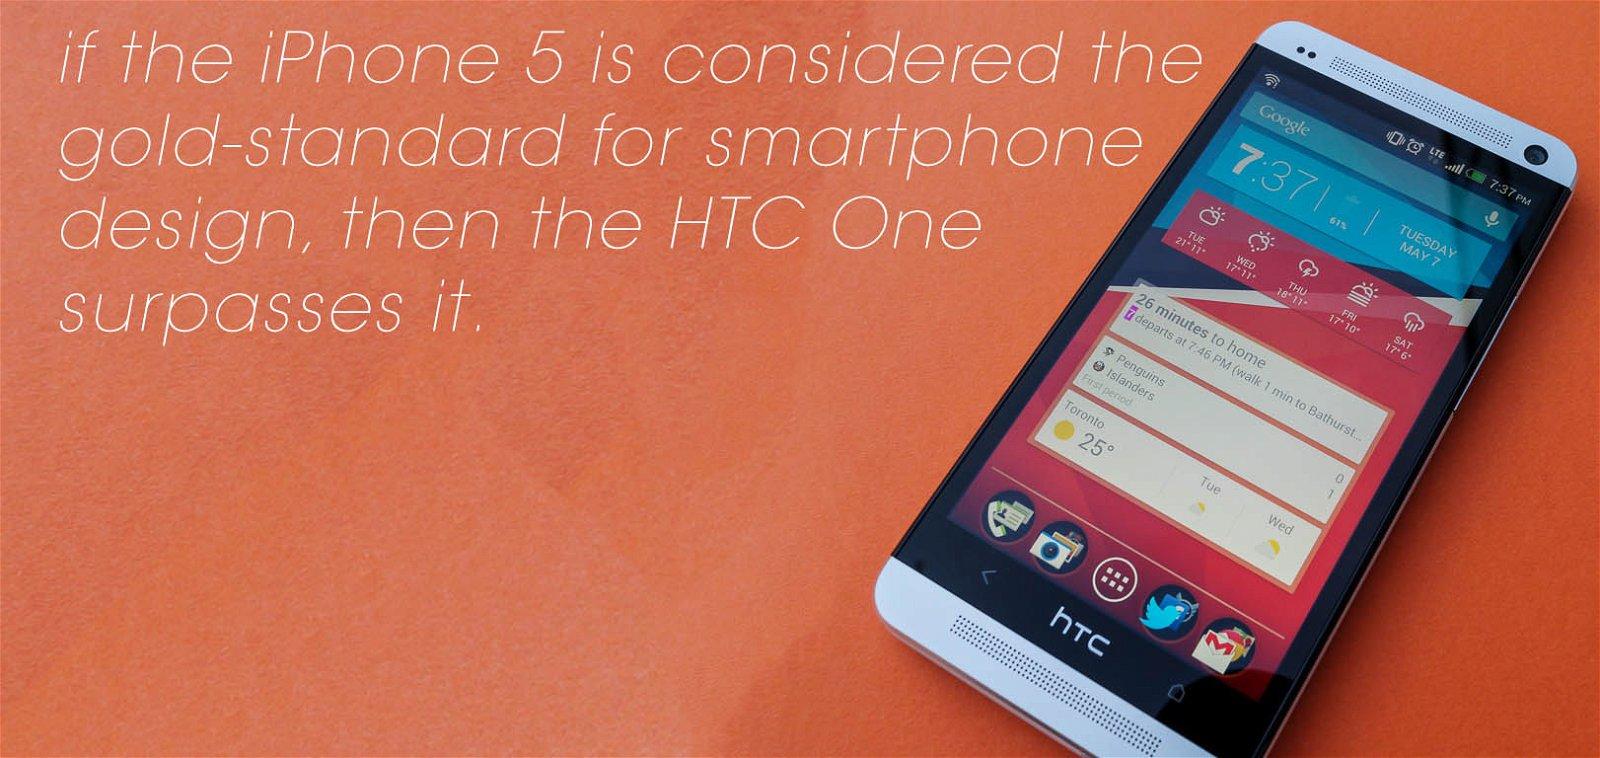 top_phone_quote.jpg